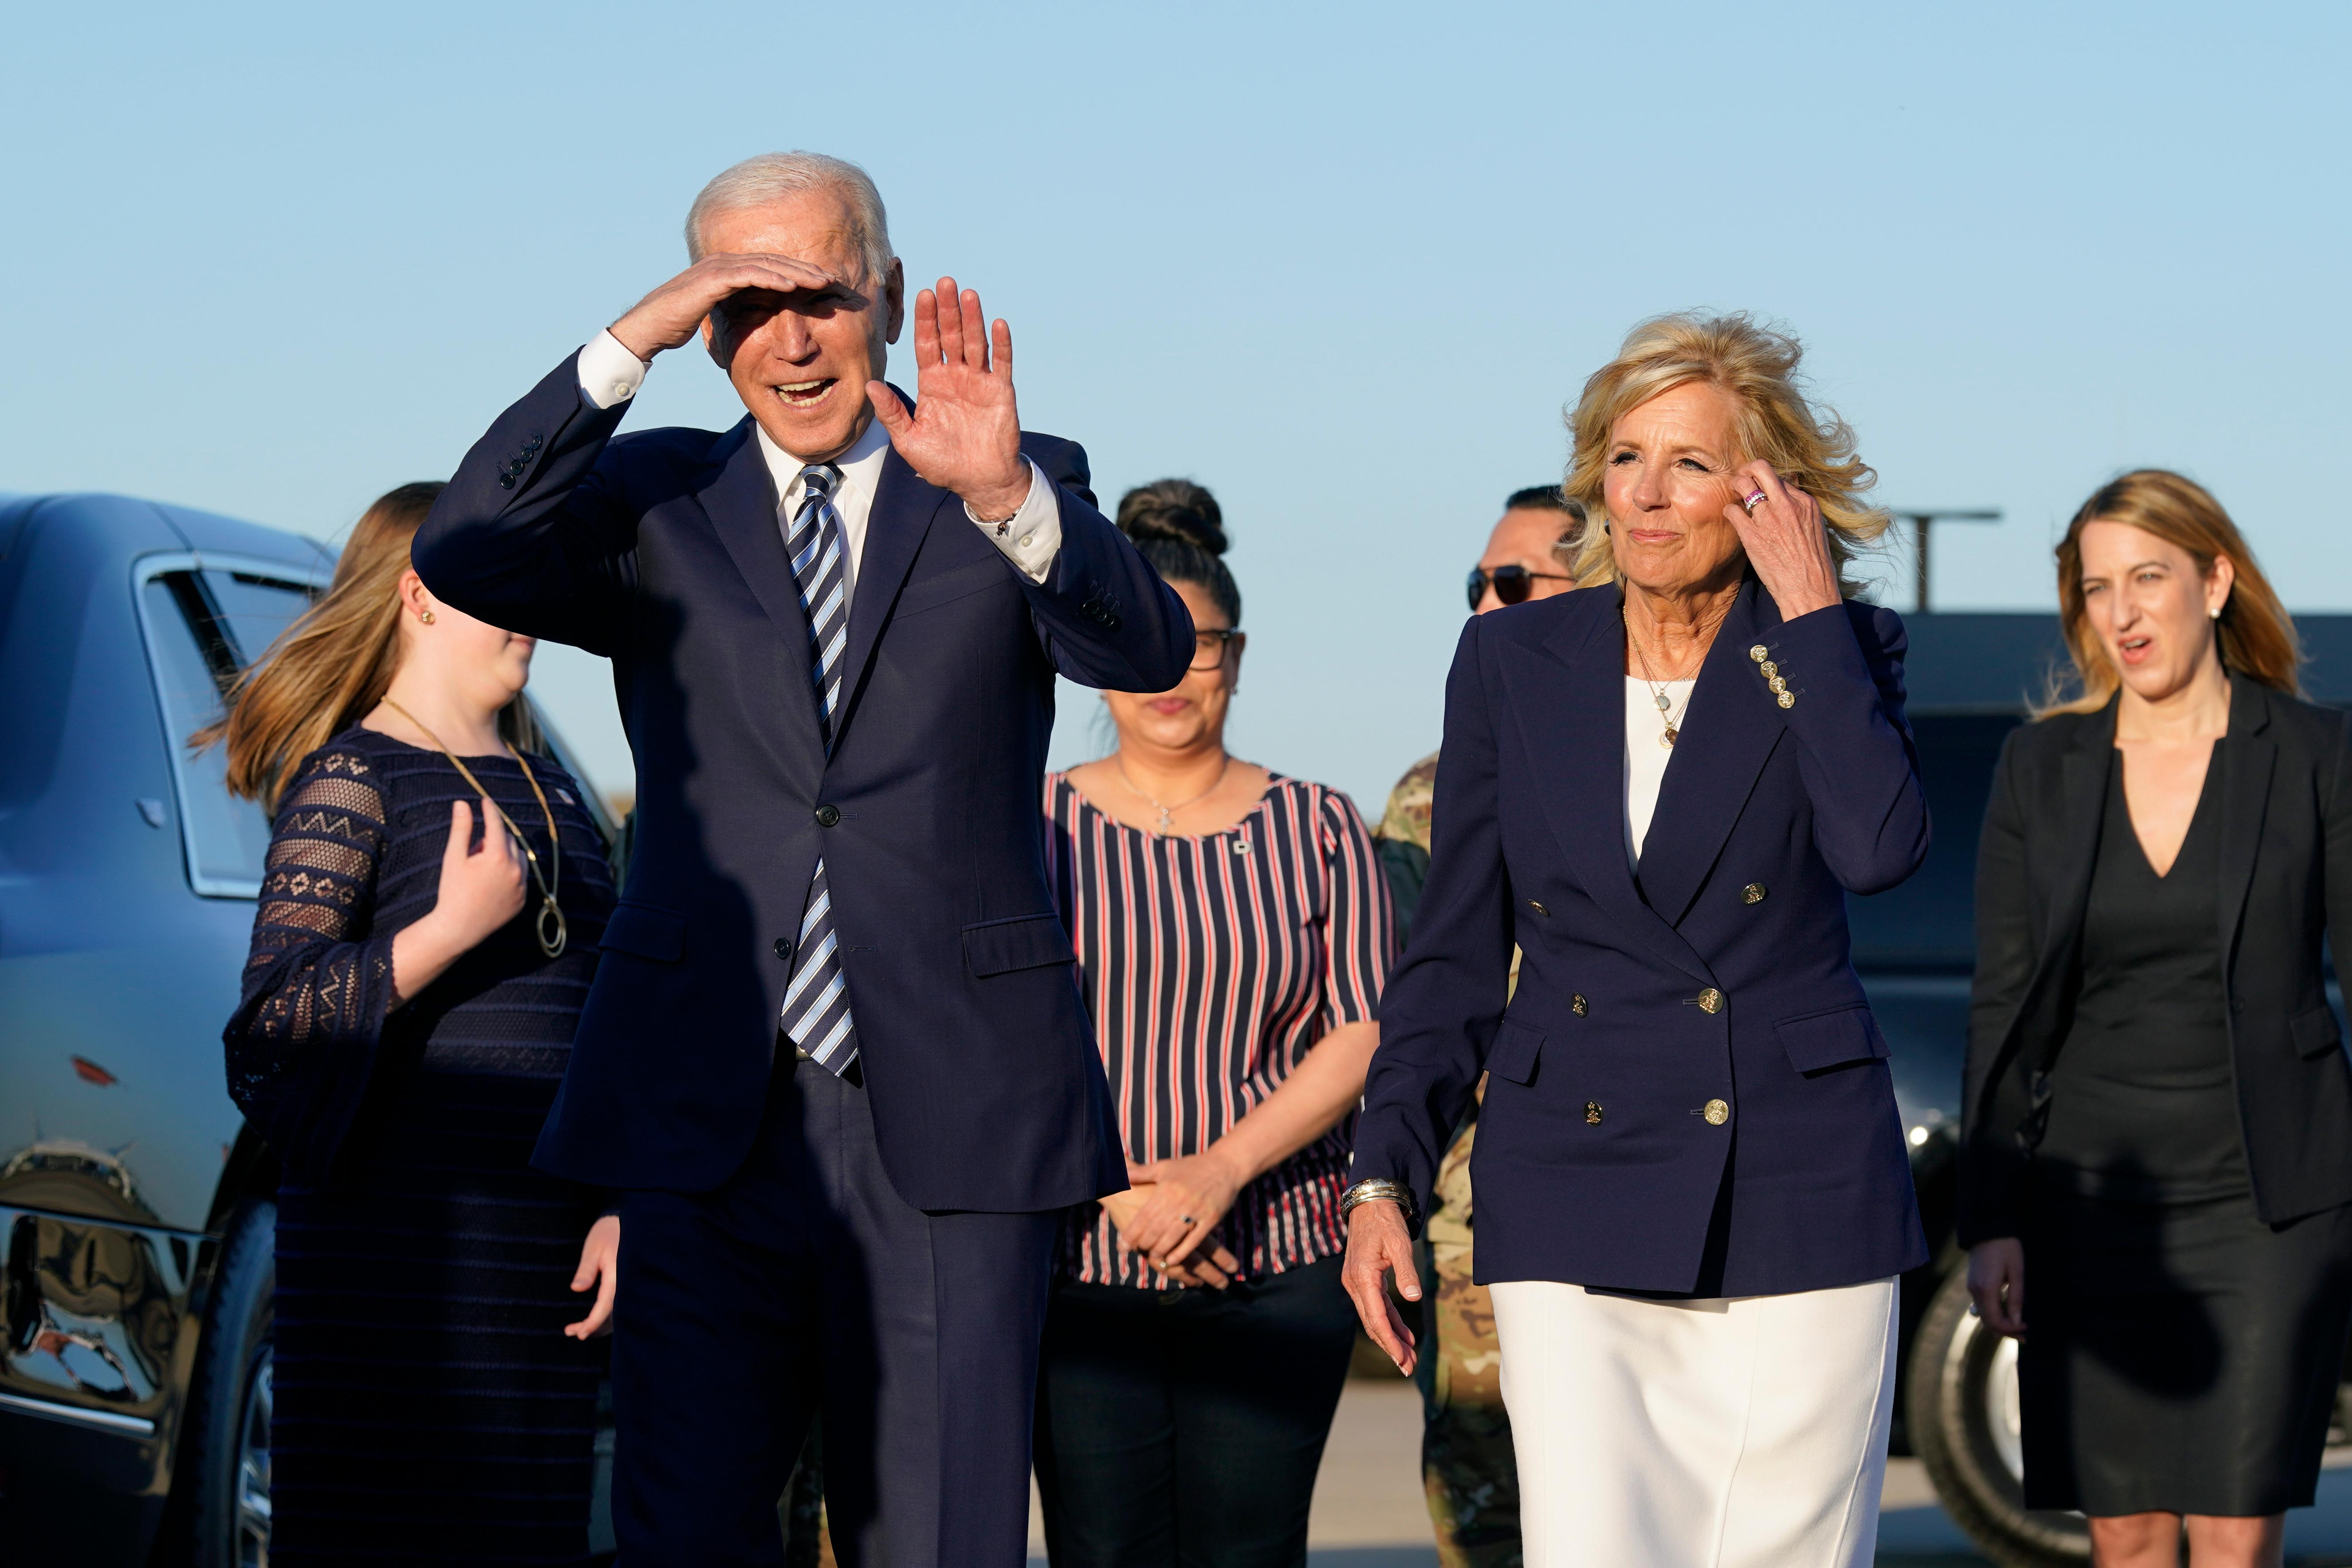 President Joe Biden and First Lady Jill Biden walk to a motorcade car after getting off Air Force One